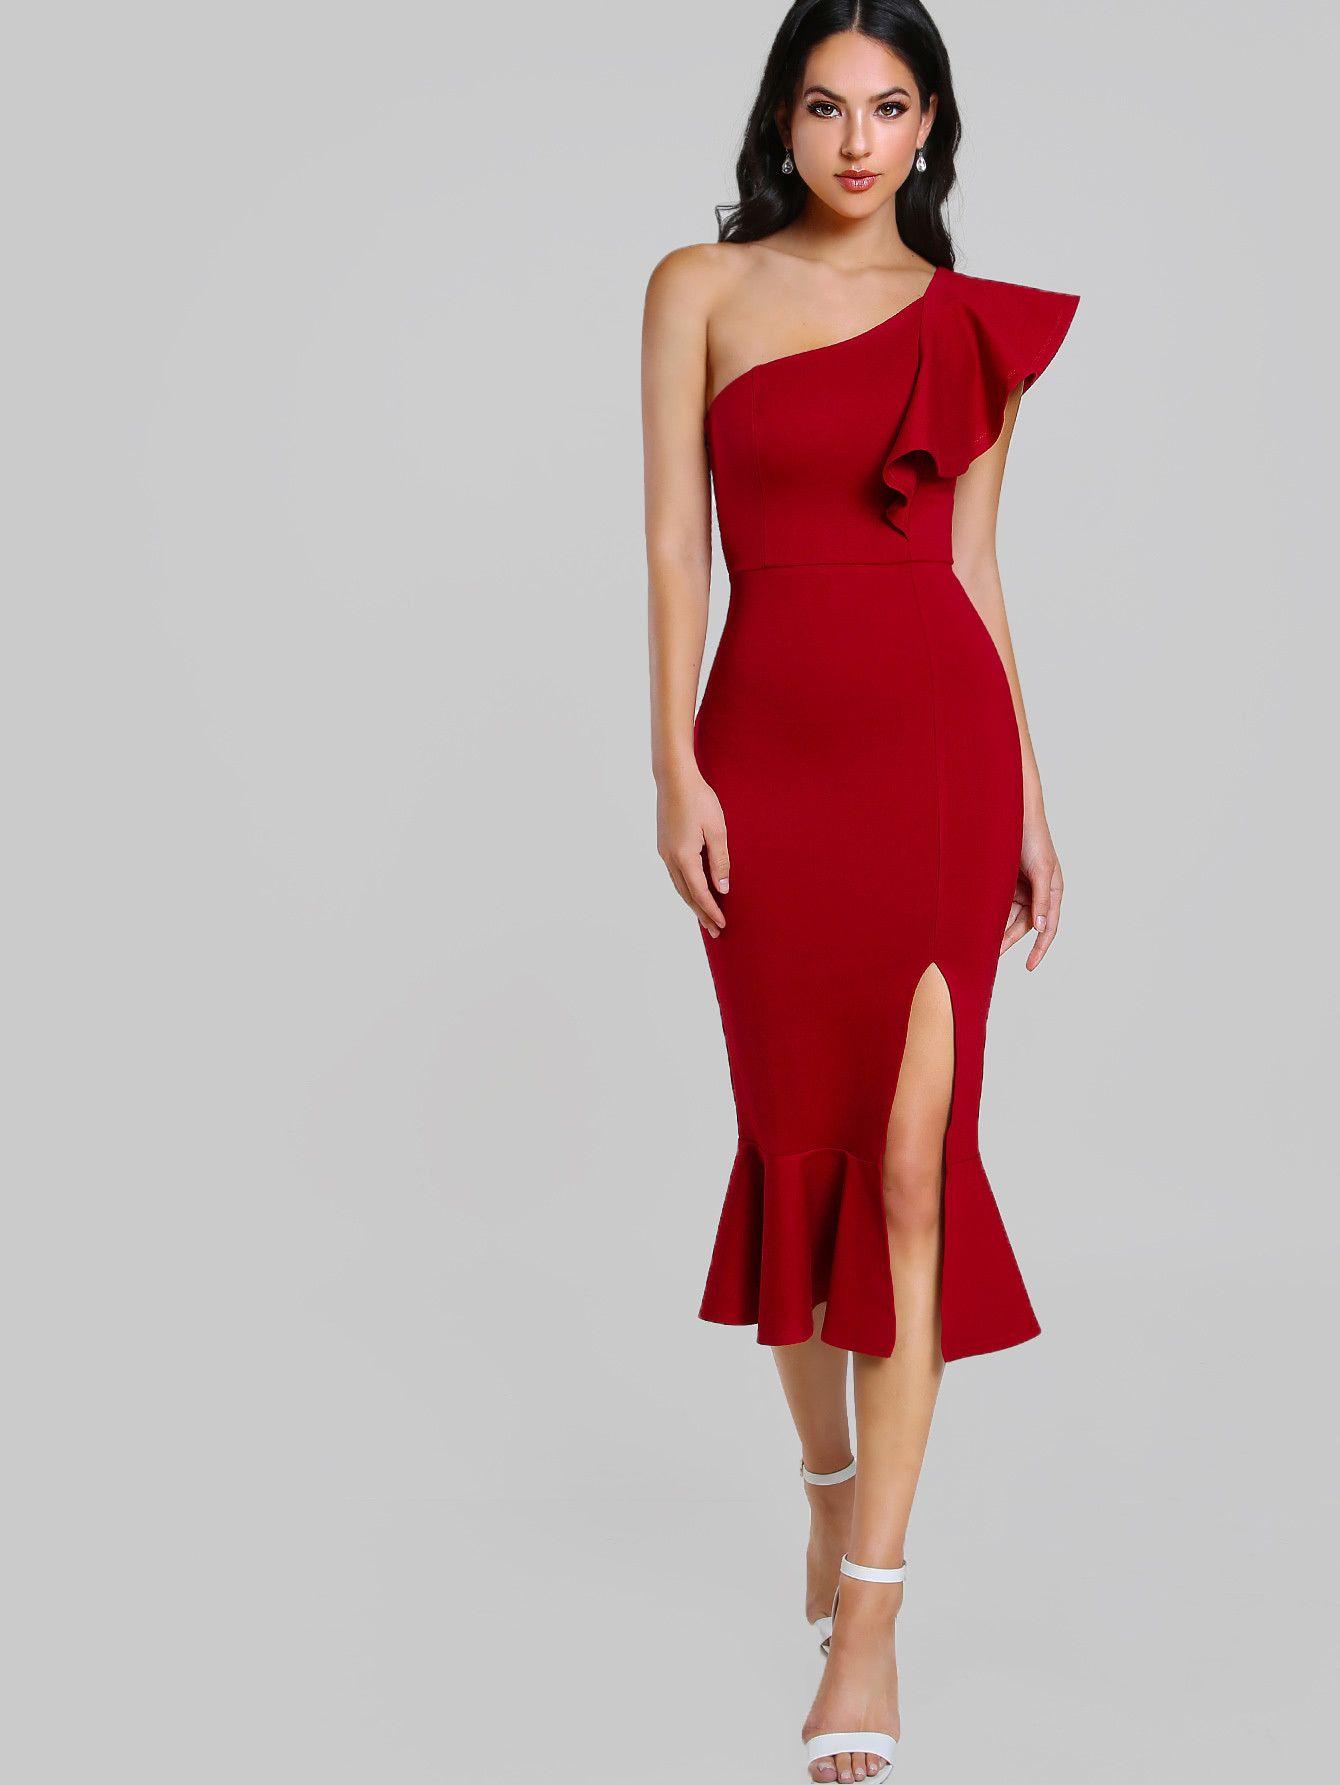 a37ca414cad7 Shop Flounce One Shoulder Slit Fishtail Dress online. SheIn offers Flounce One  Shoulder Slit Fishtail Dress   more to fit your fashionable needs.